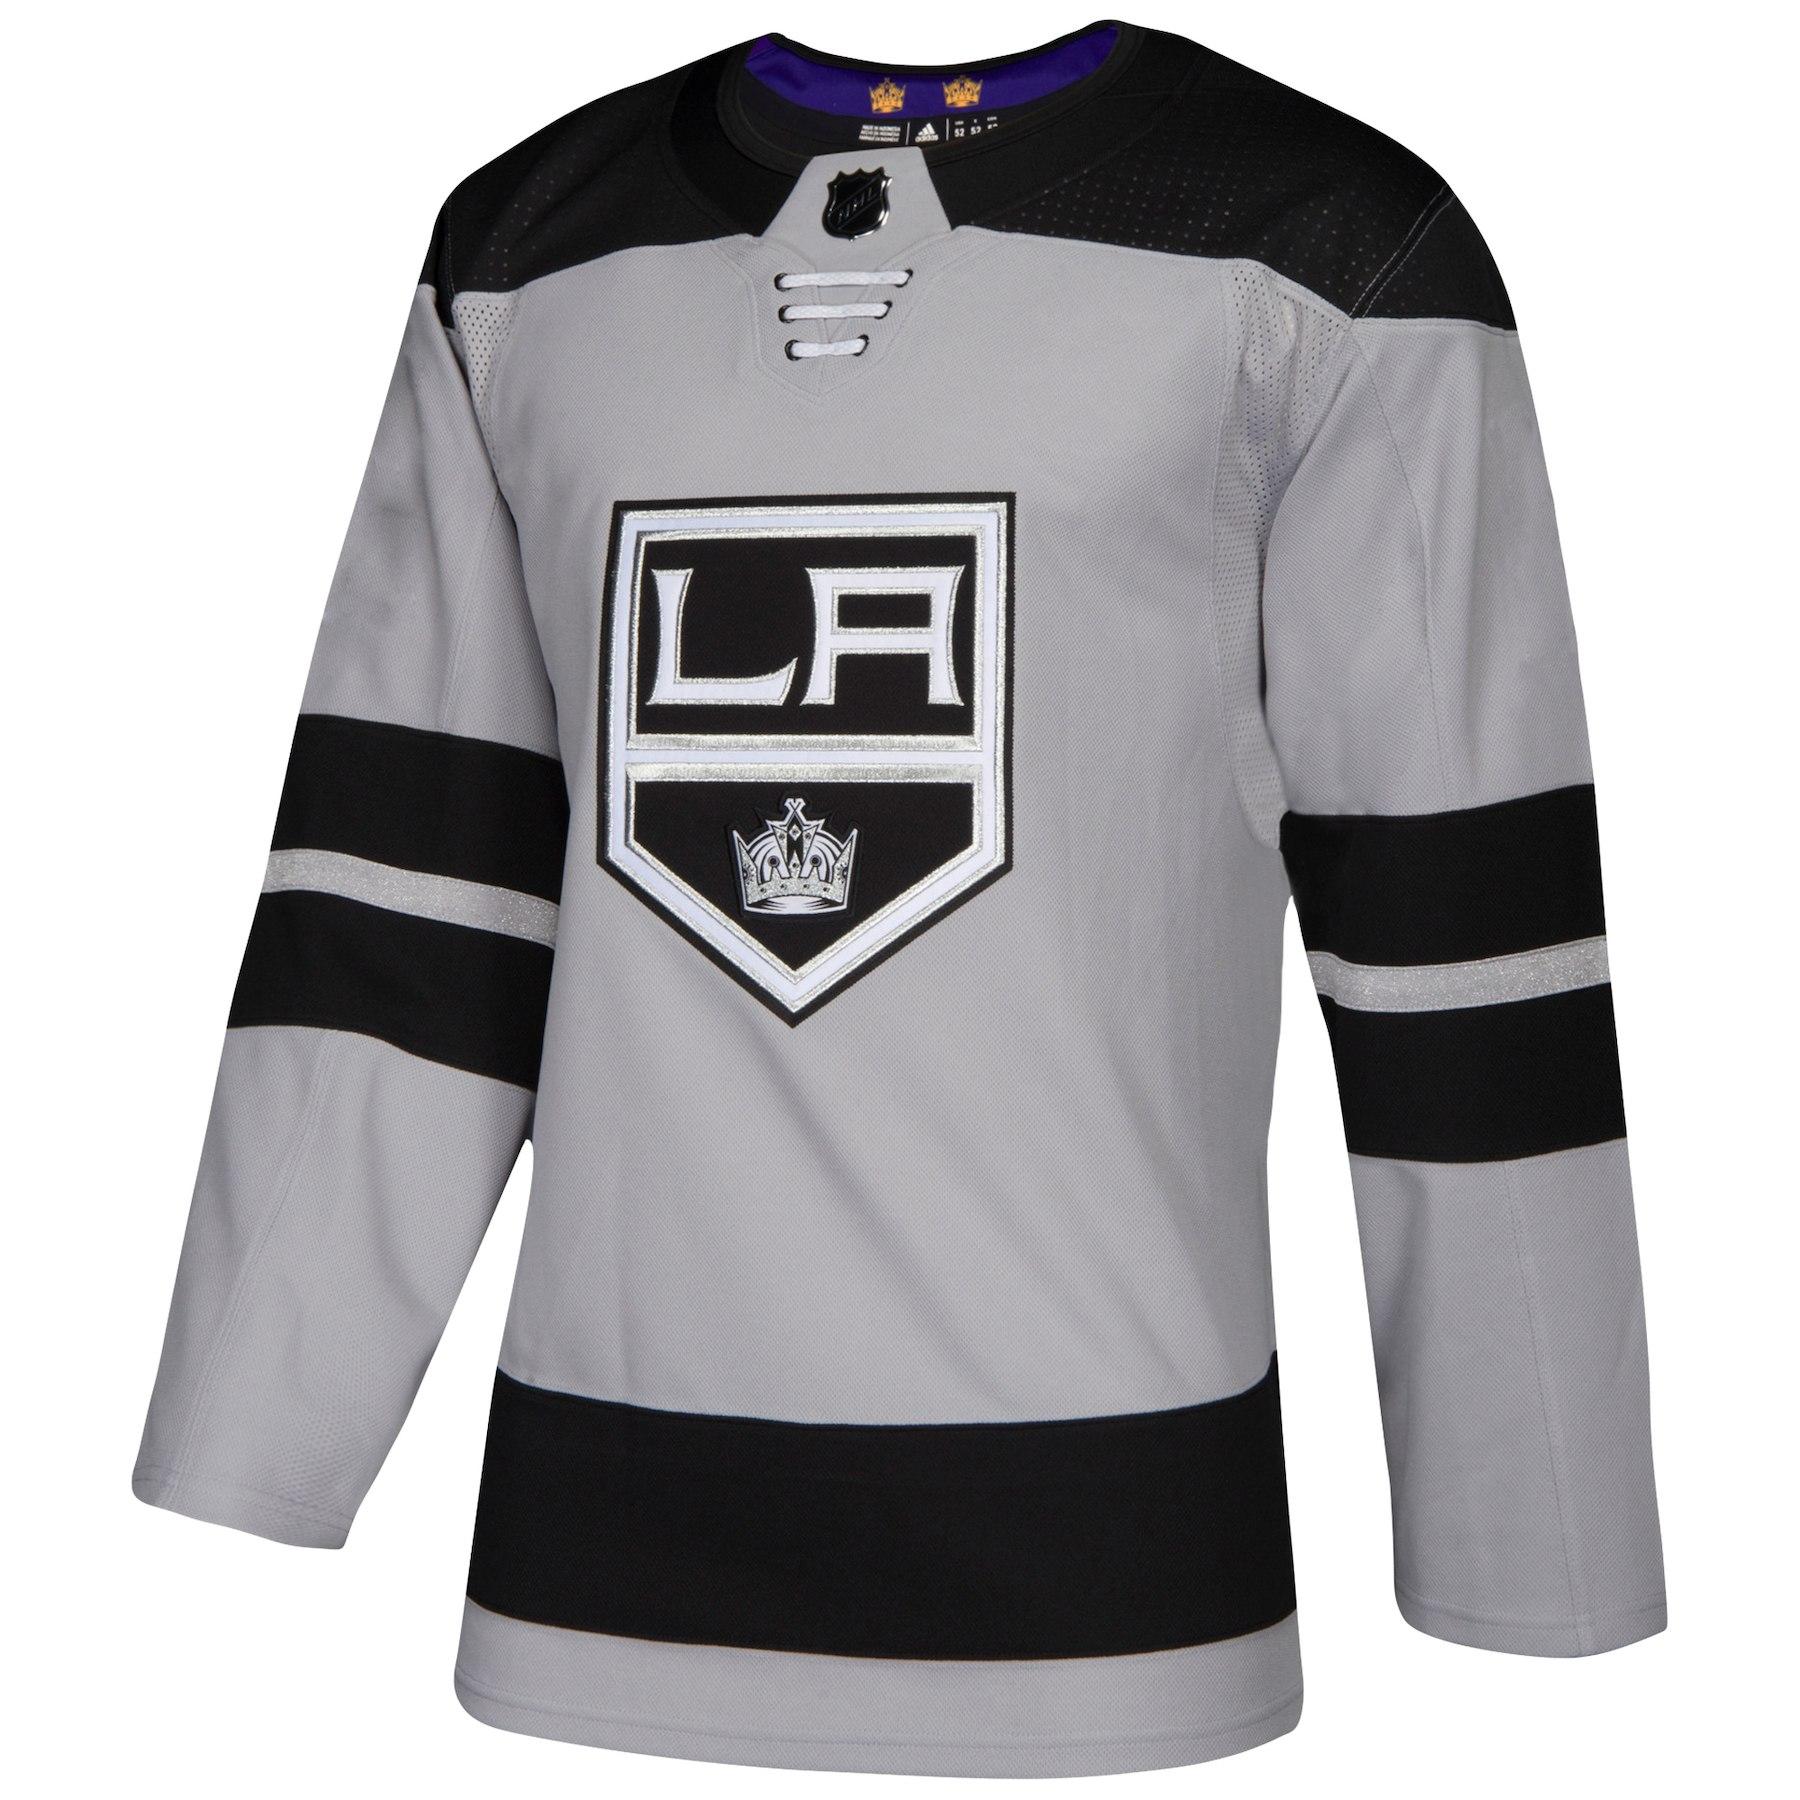 half off 5392e ff0d3 Los Angeles Kings adidas adizero NHL Authentic Pro Alternate Jersey